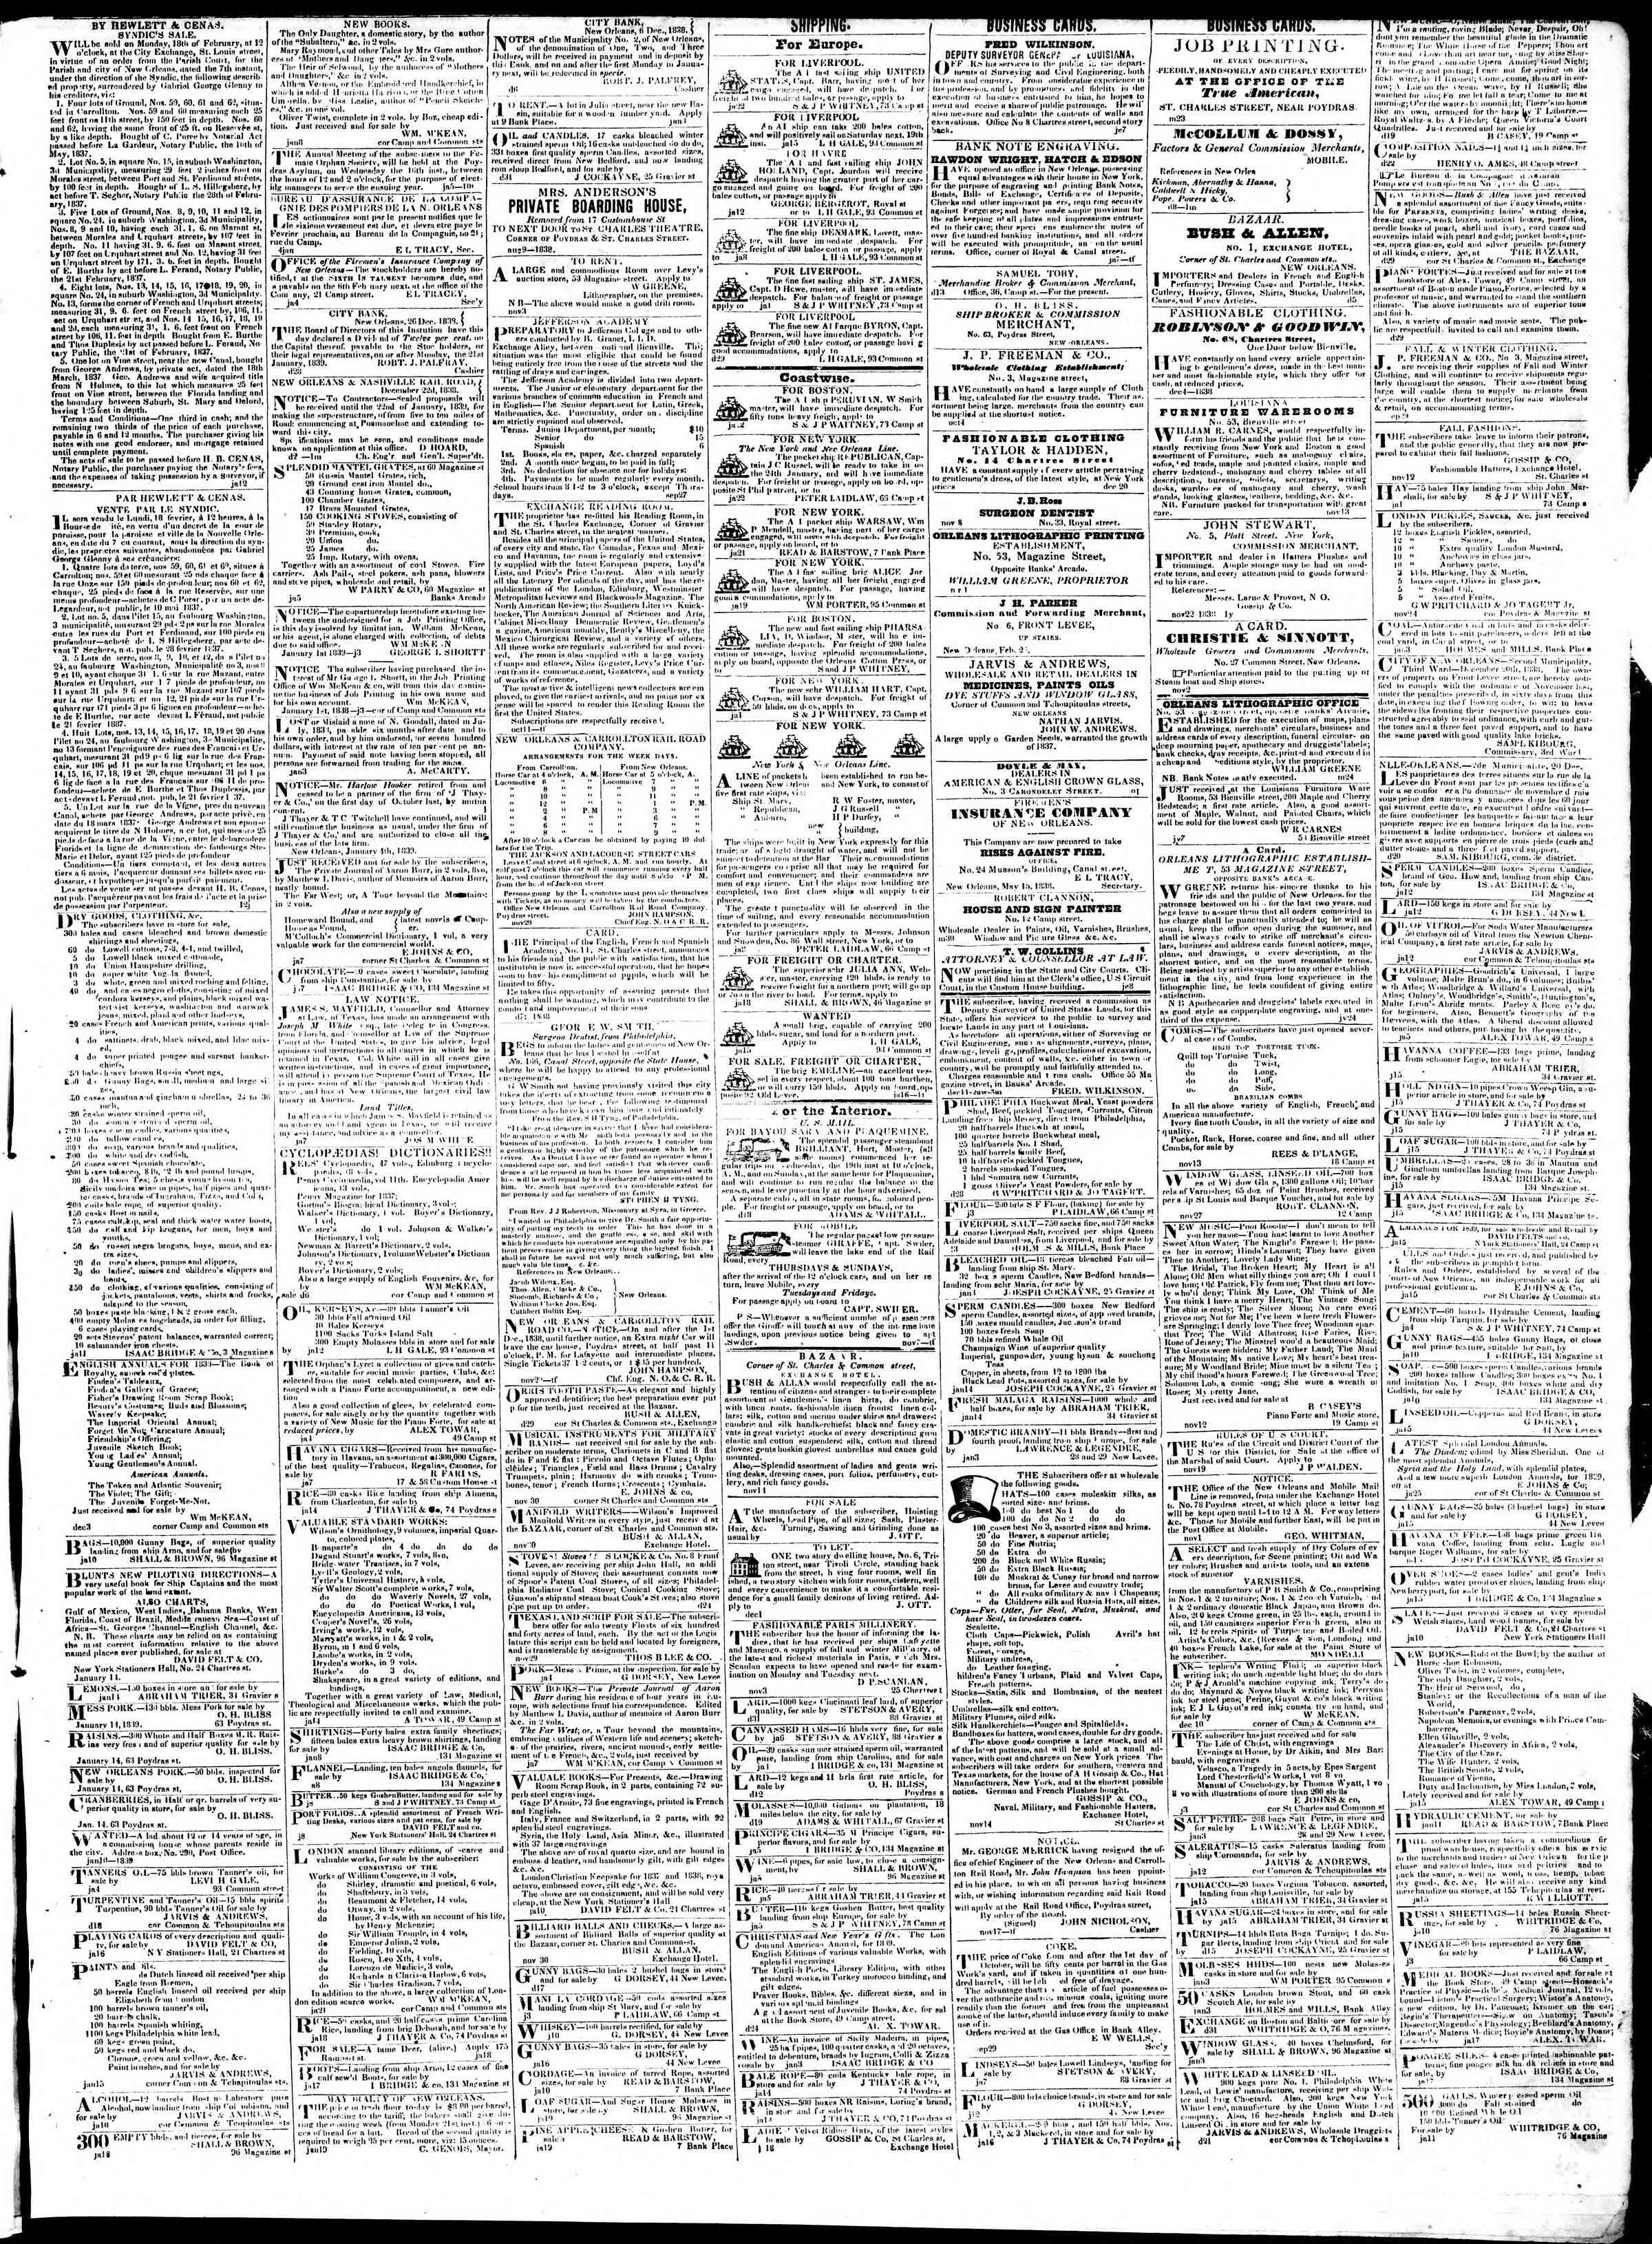 January 23, 1839 Tarihli True American Gazetesi Sayfa 3